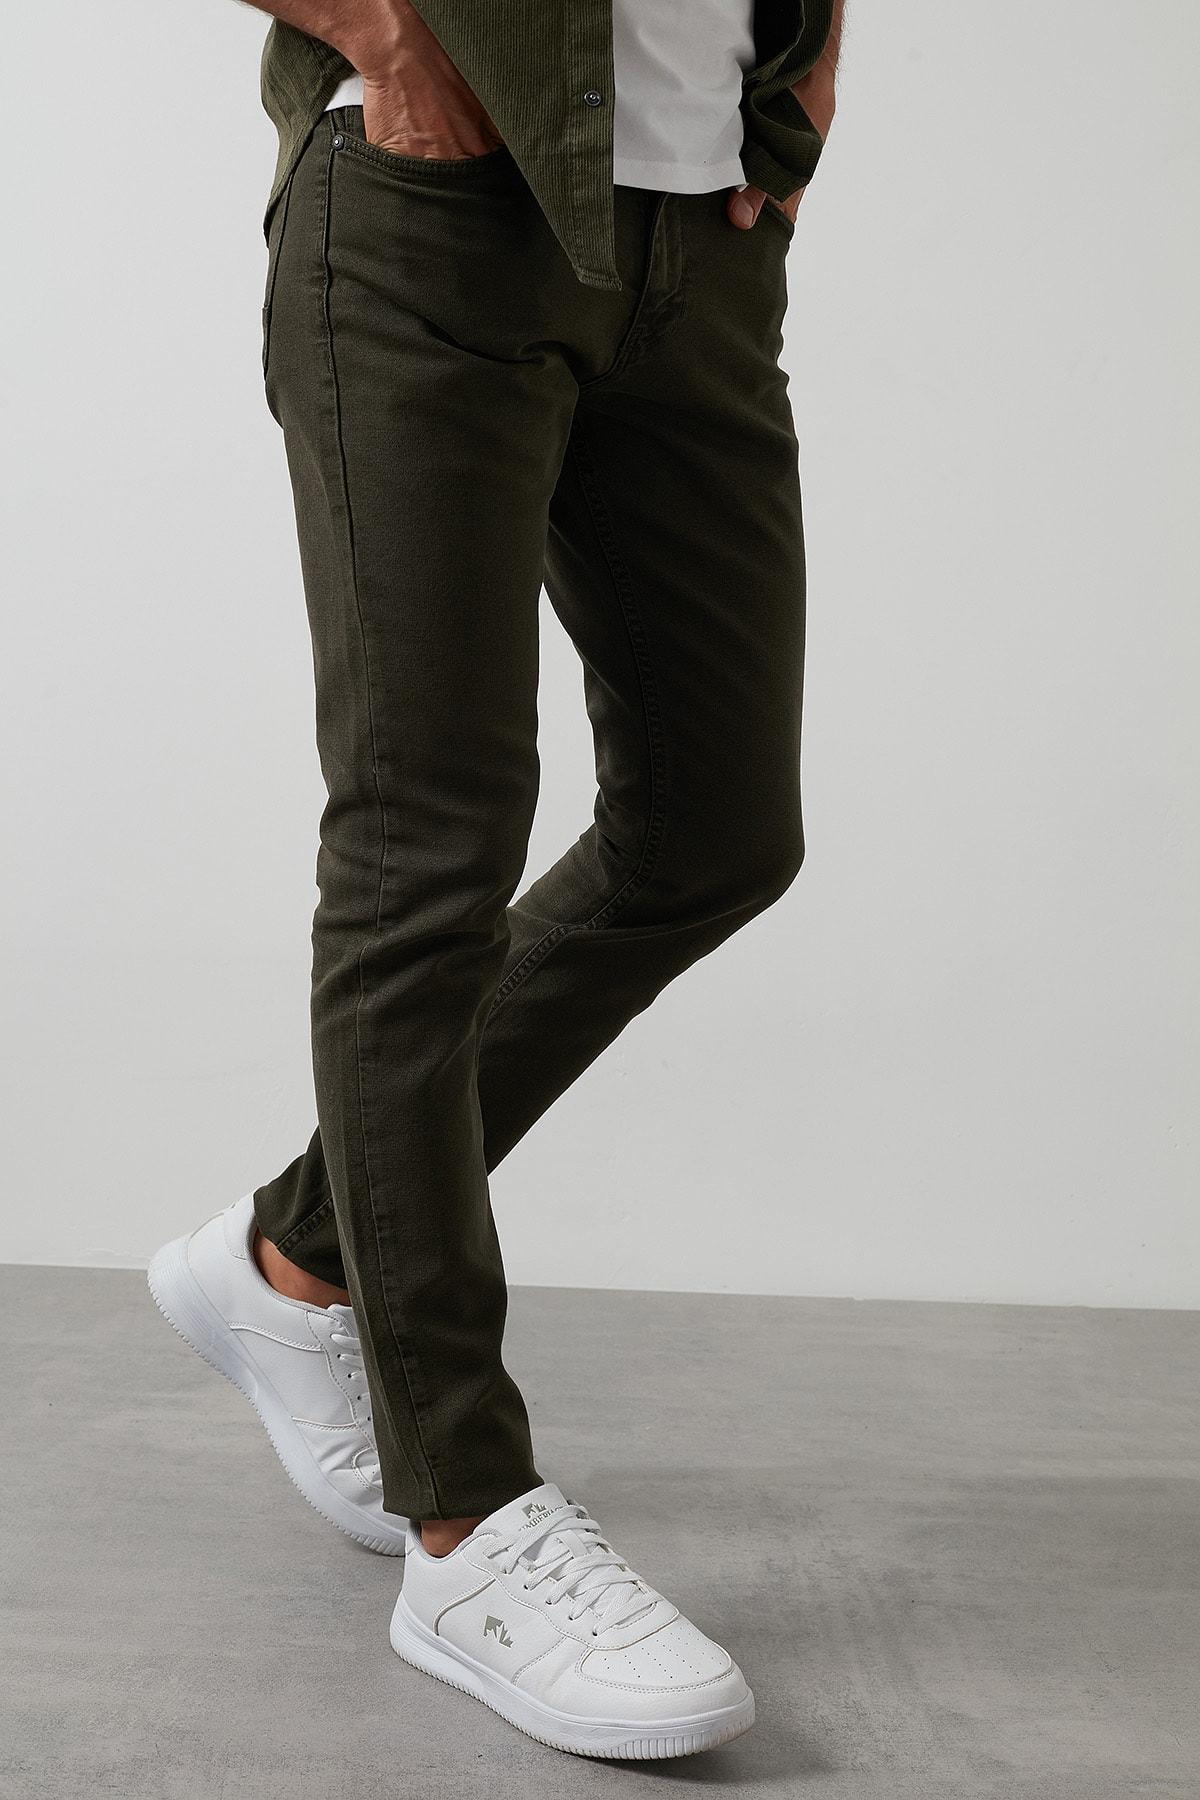 Buratti Erkek Haki 7267f4132zagor Regular Fit Pamuklu Jeans Kot Pantolon 2